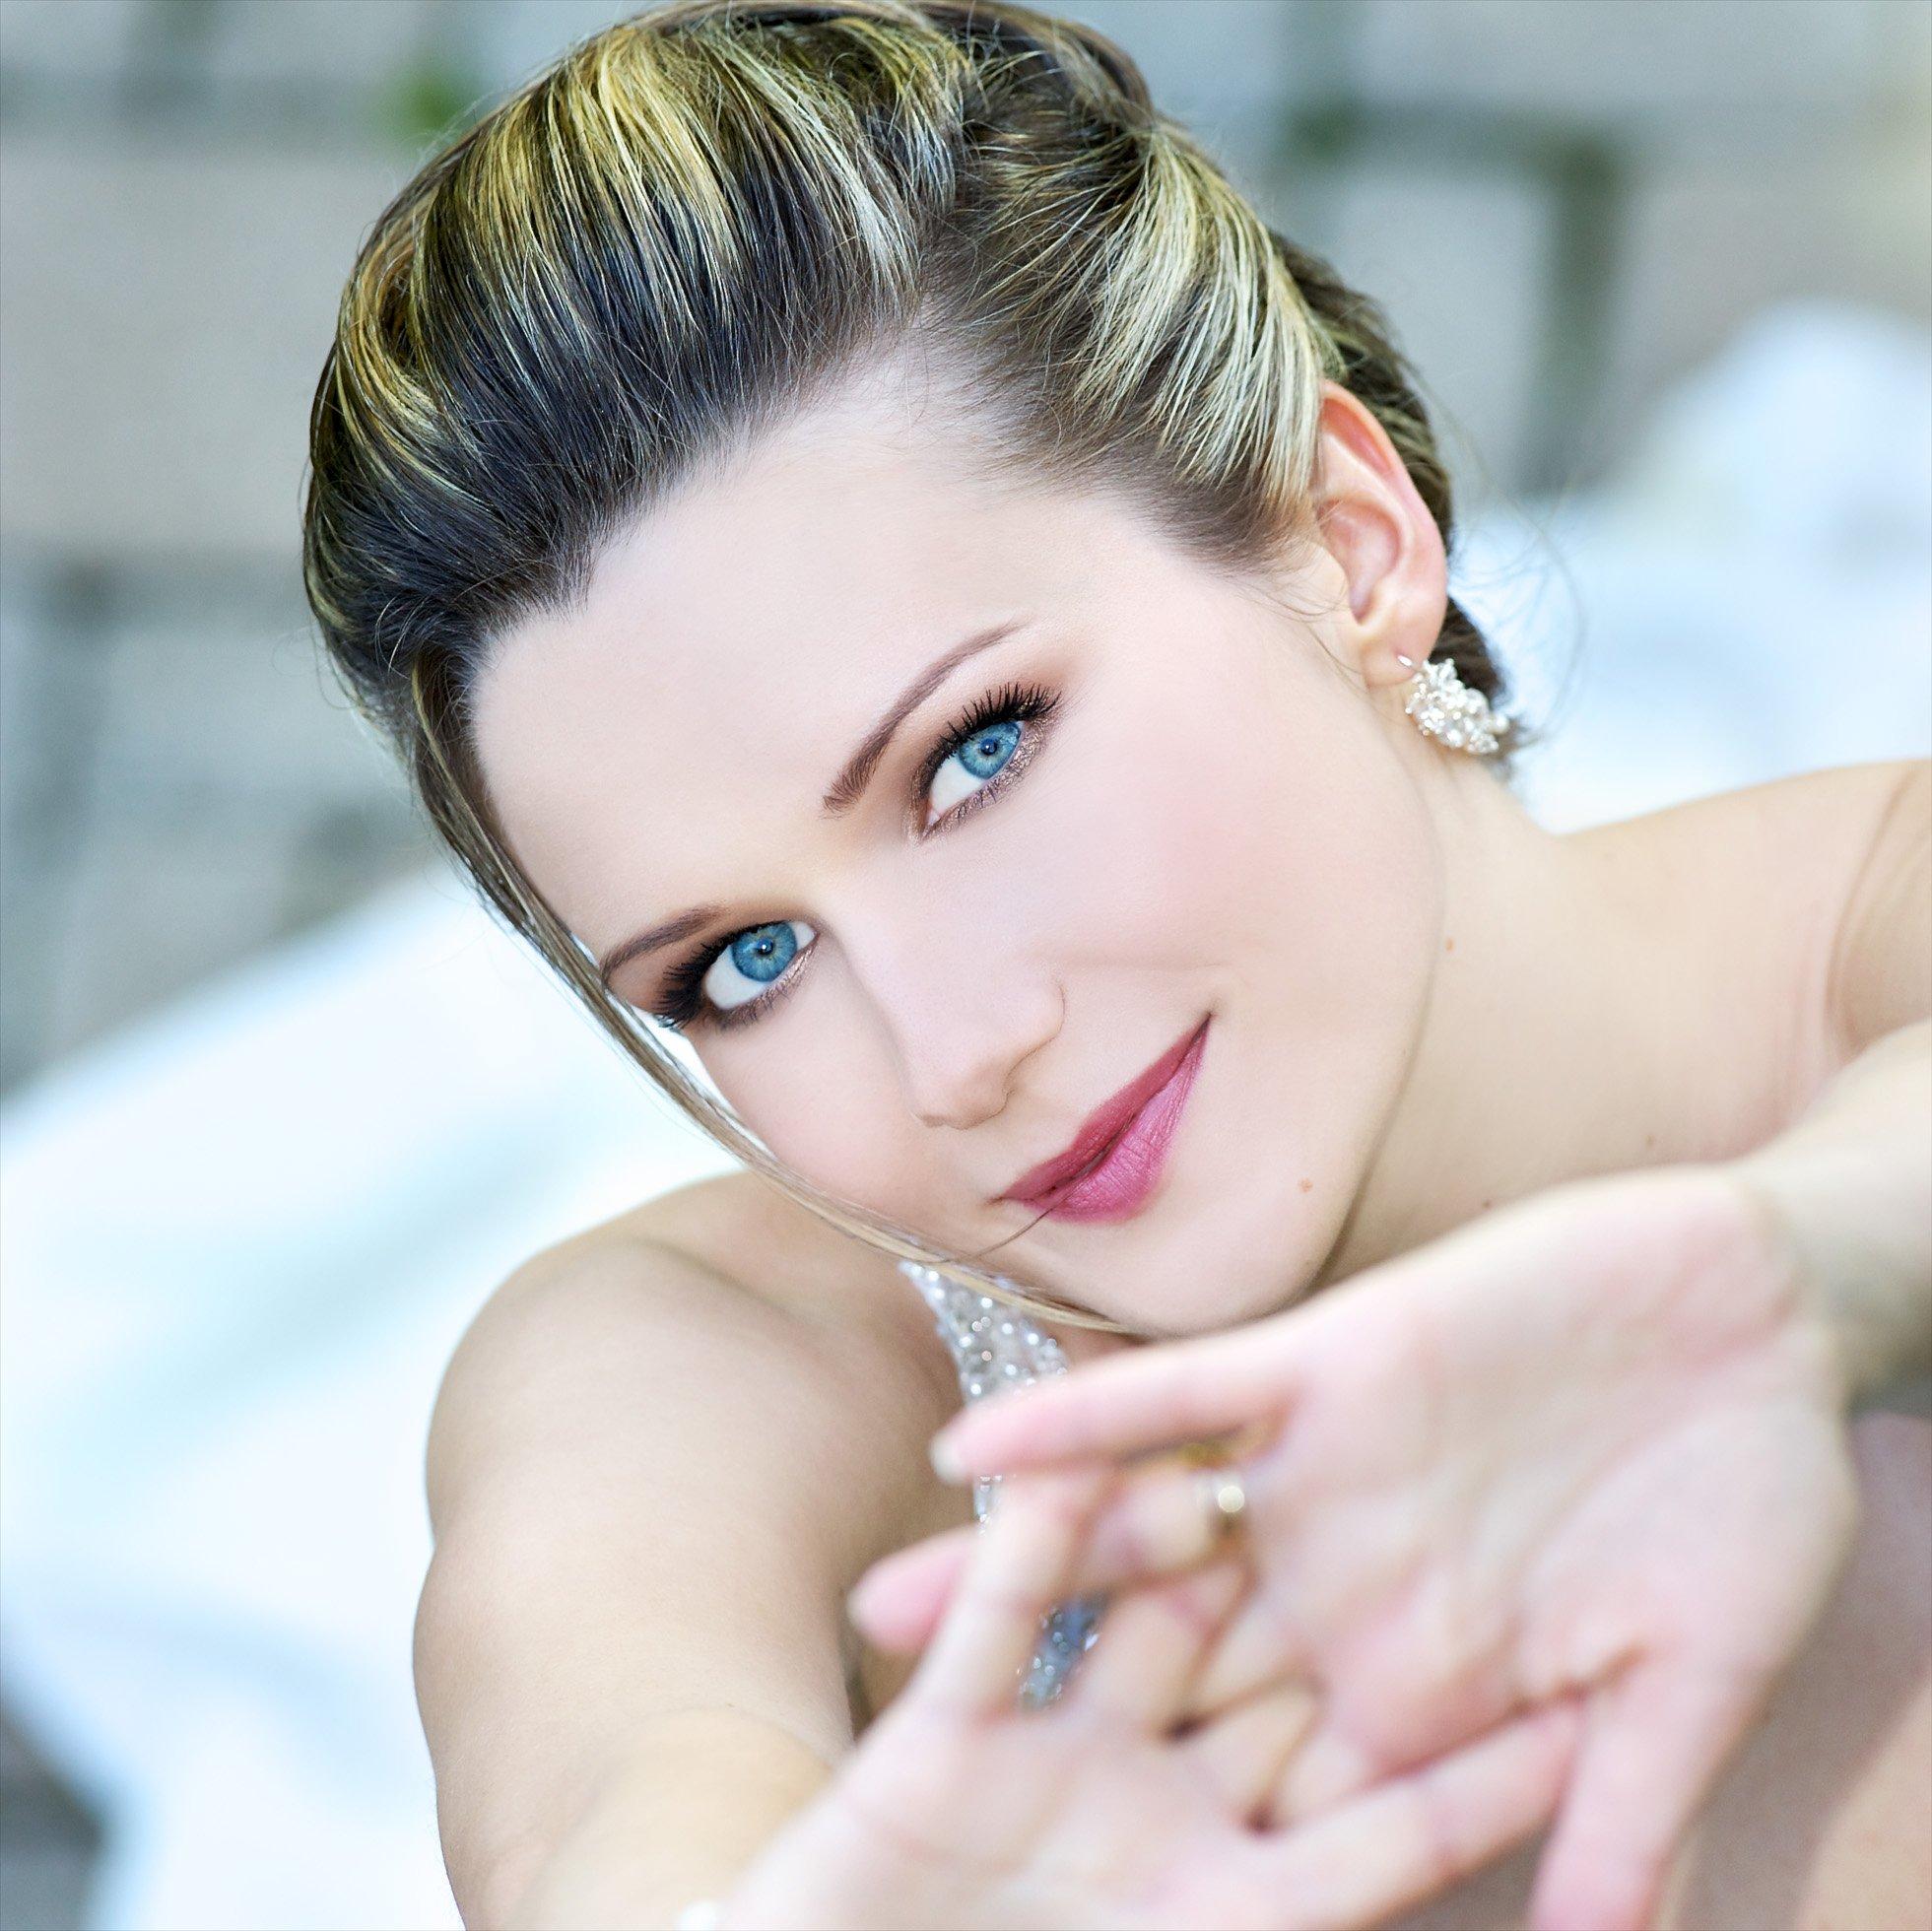 Toronto Bride image